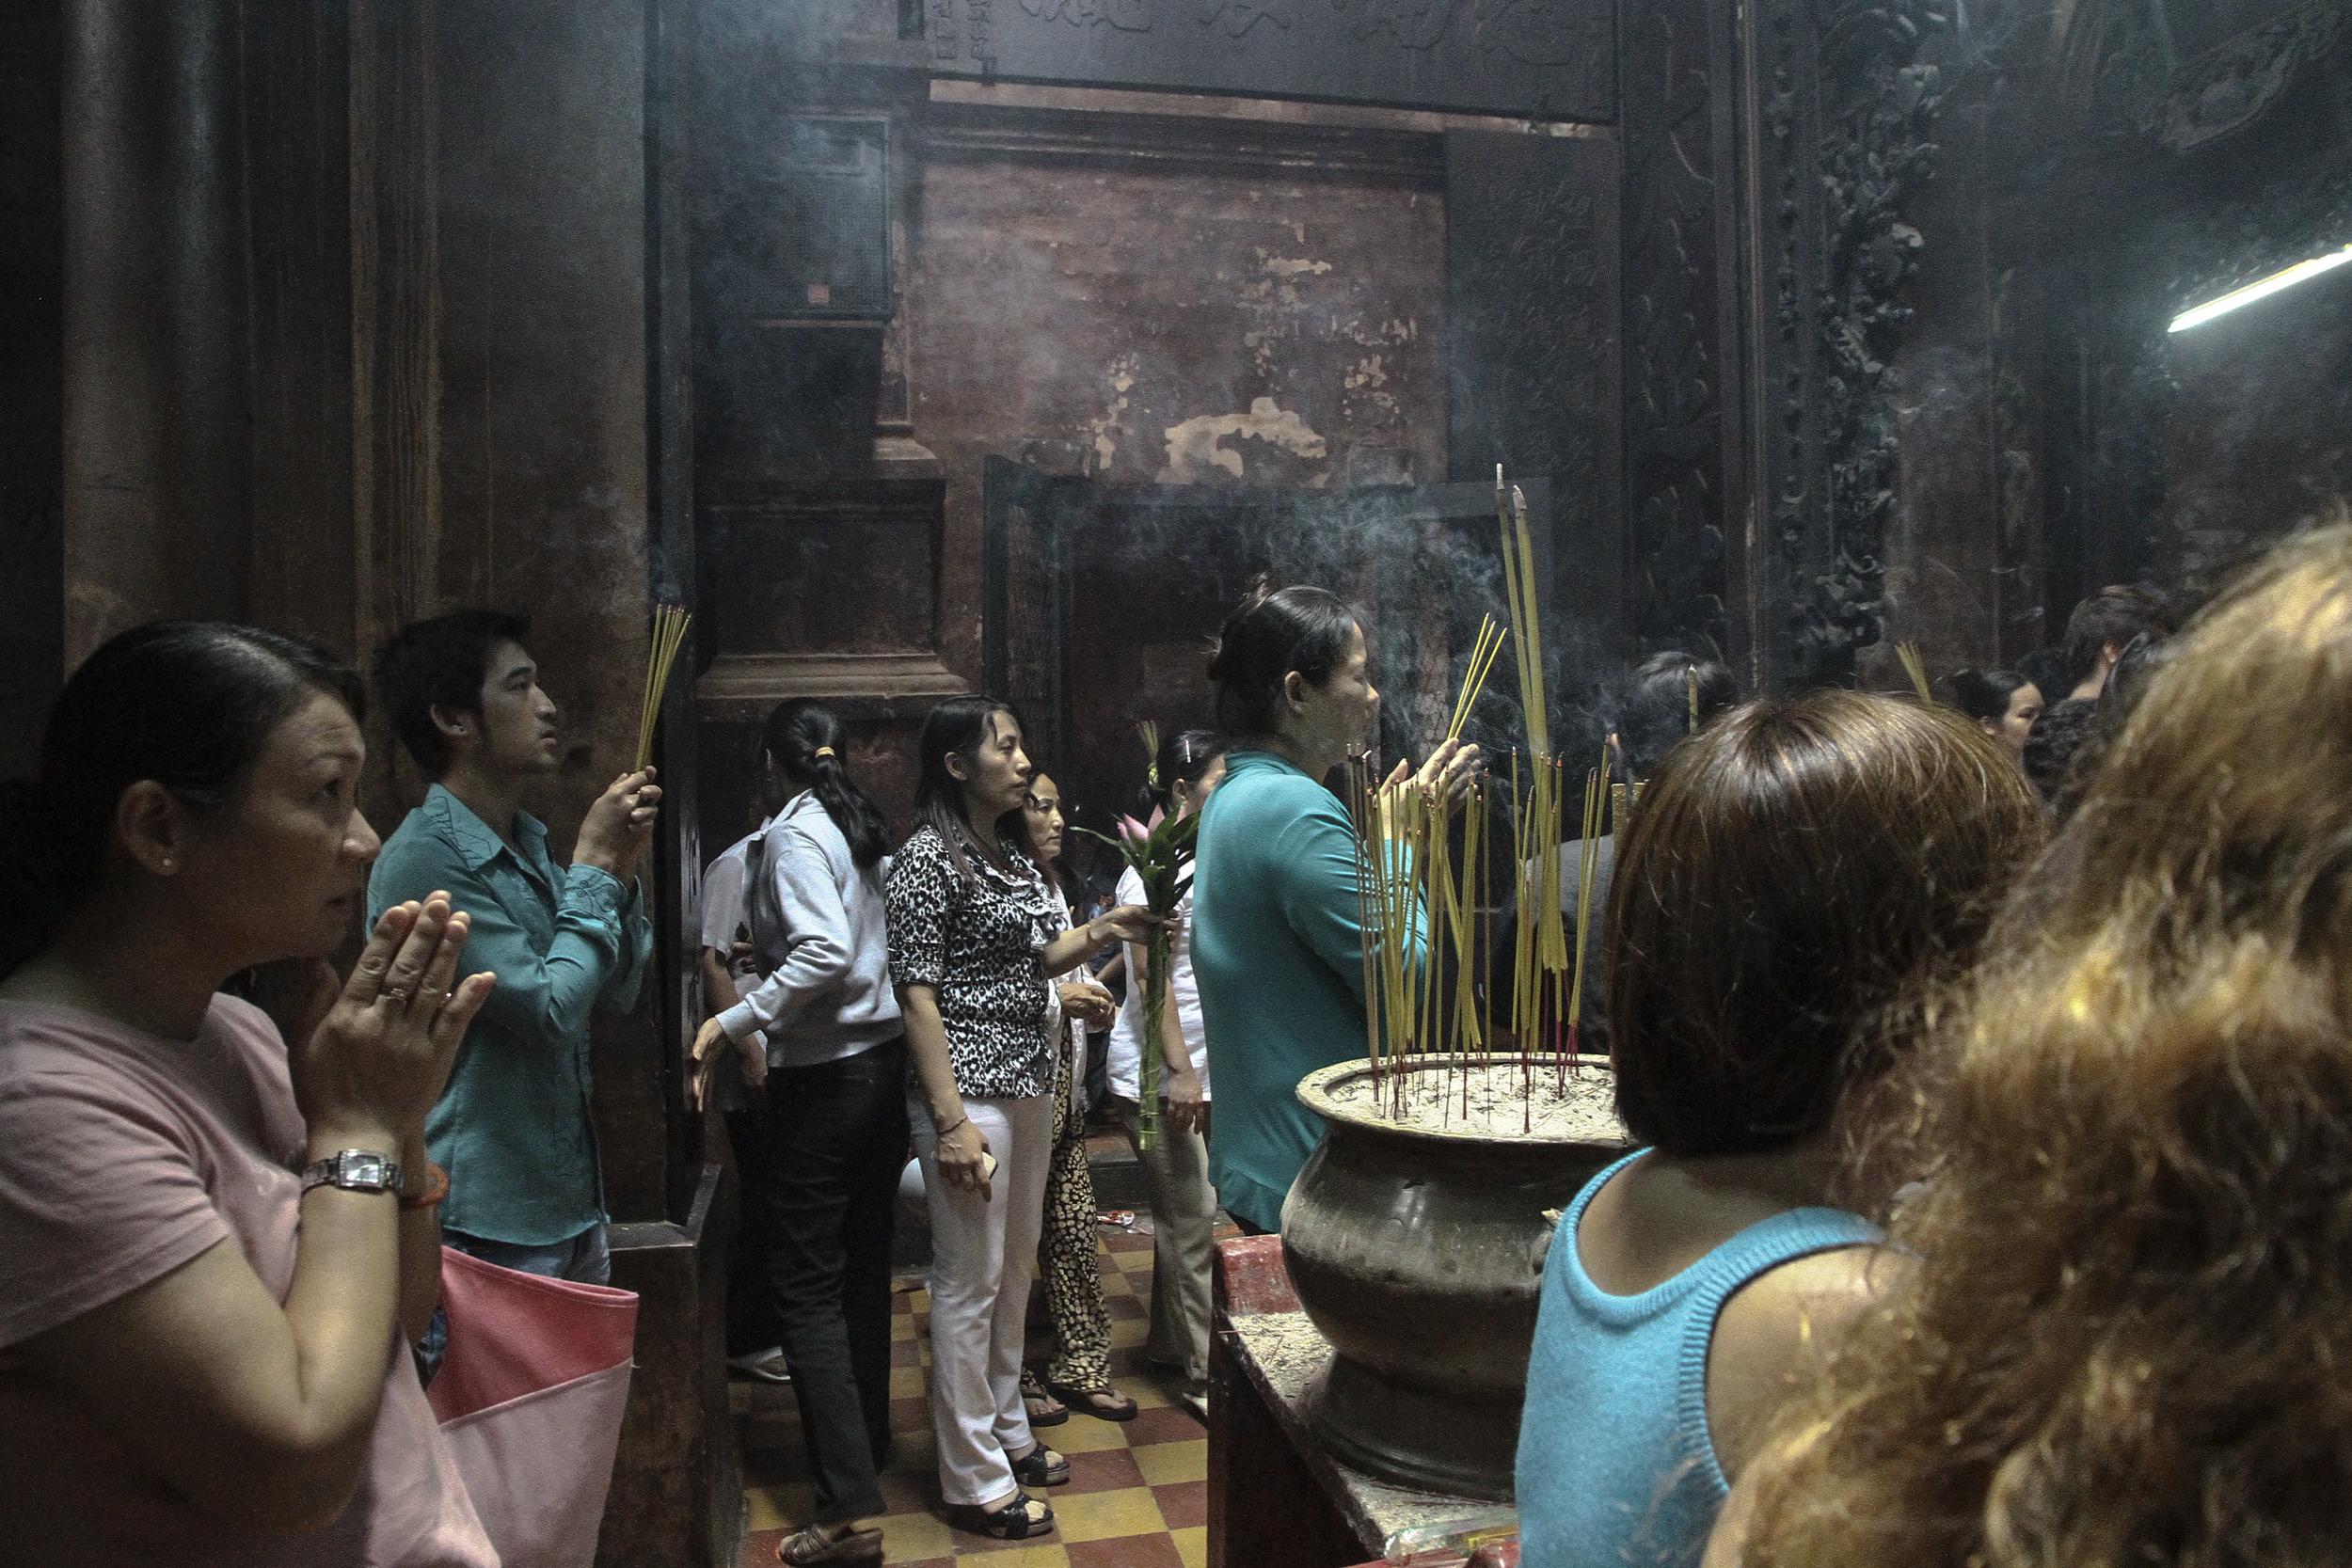 Praying. Ho Chi Minh City, Vietnam